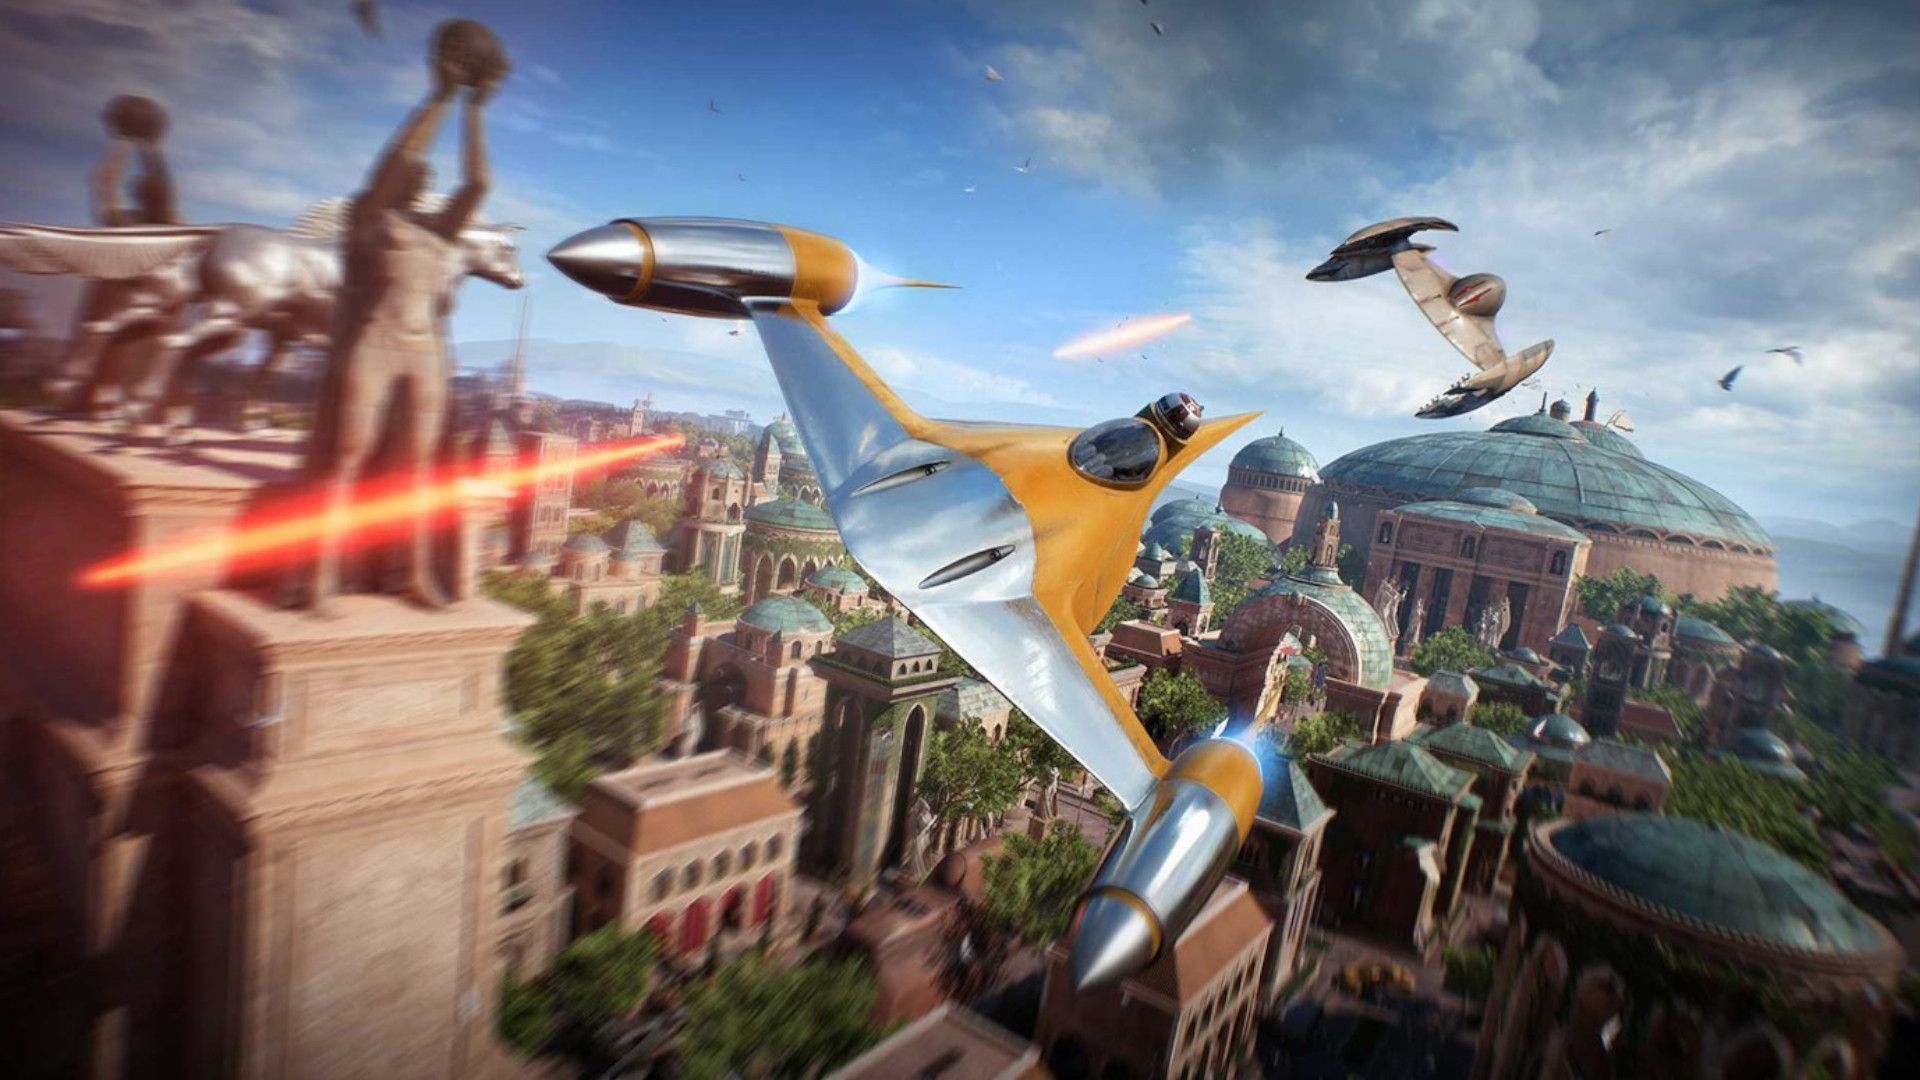 Star Wars: Battlefront 2 giveaway crashes servers, EA promises increased capacity